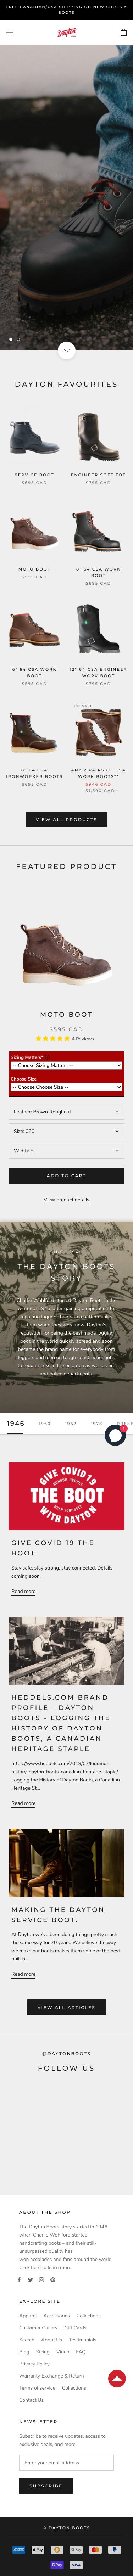 Dayton Boots Partner Program Coupon